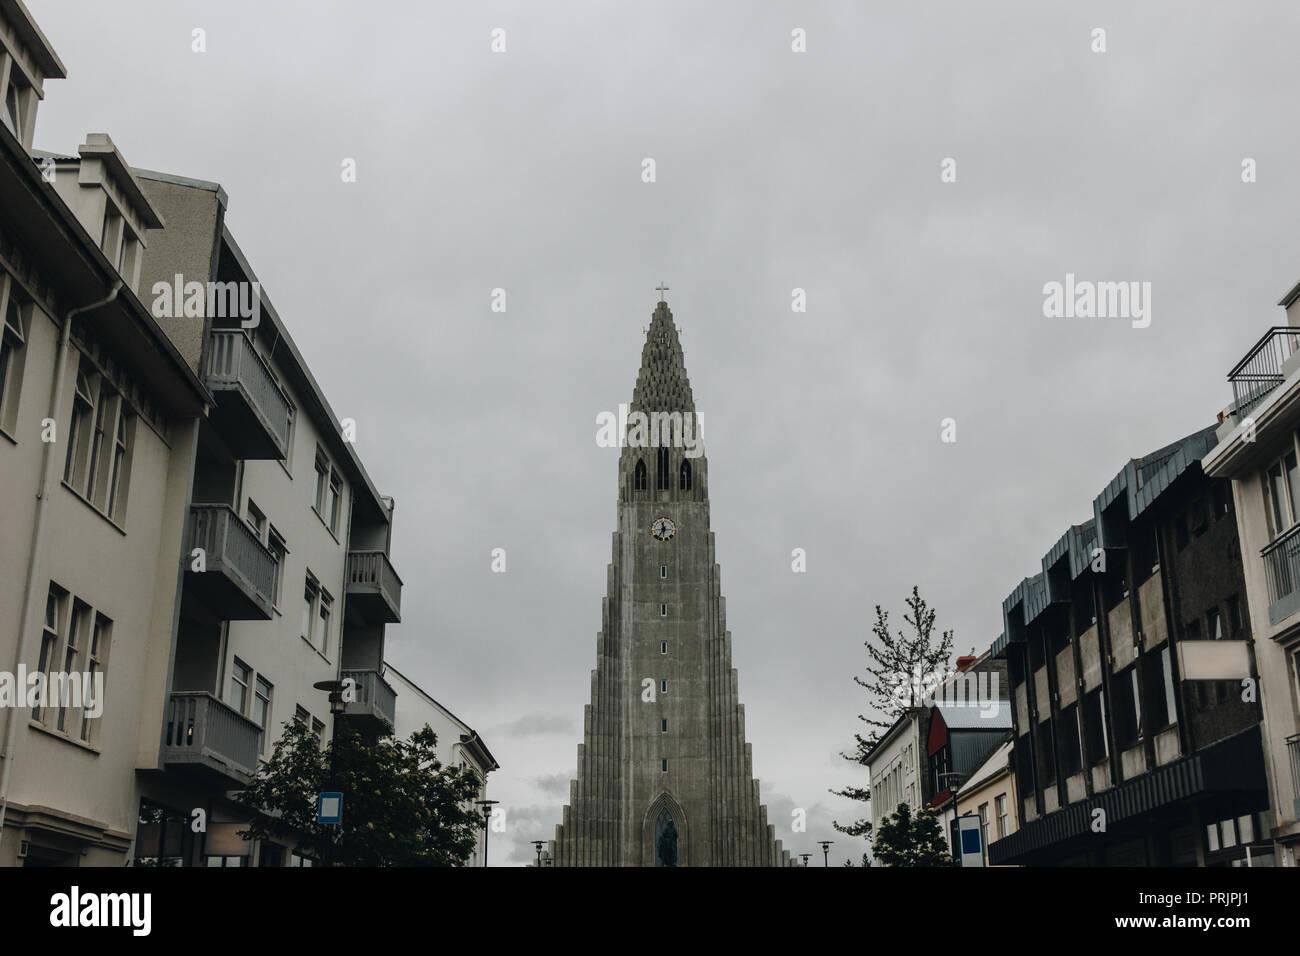 REYKJAVIK, ICELAND - 22 JUNE 2018: spire of Hallgrimskirkja church ...